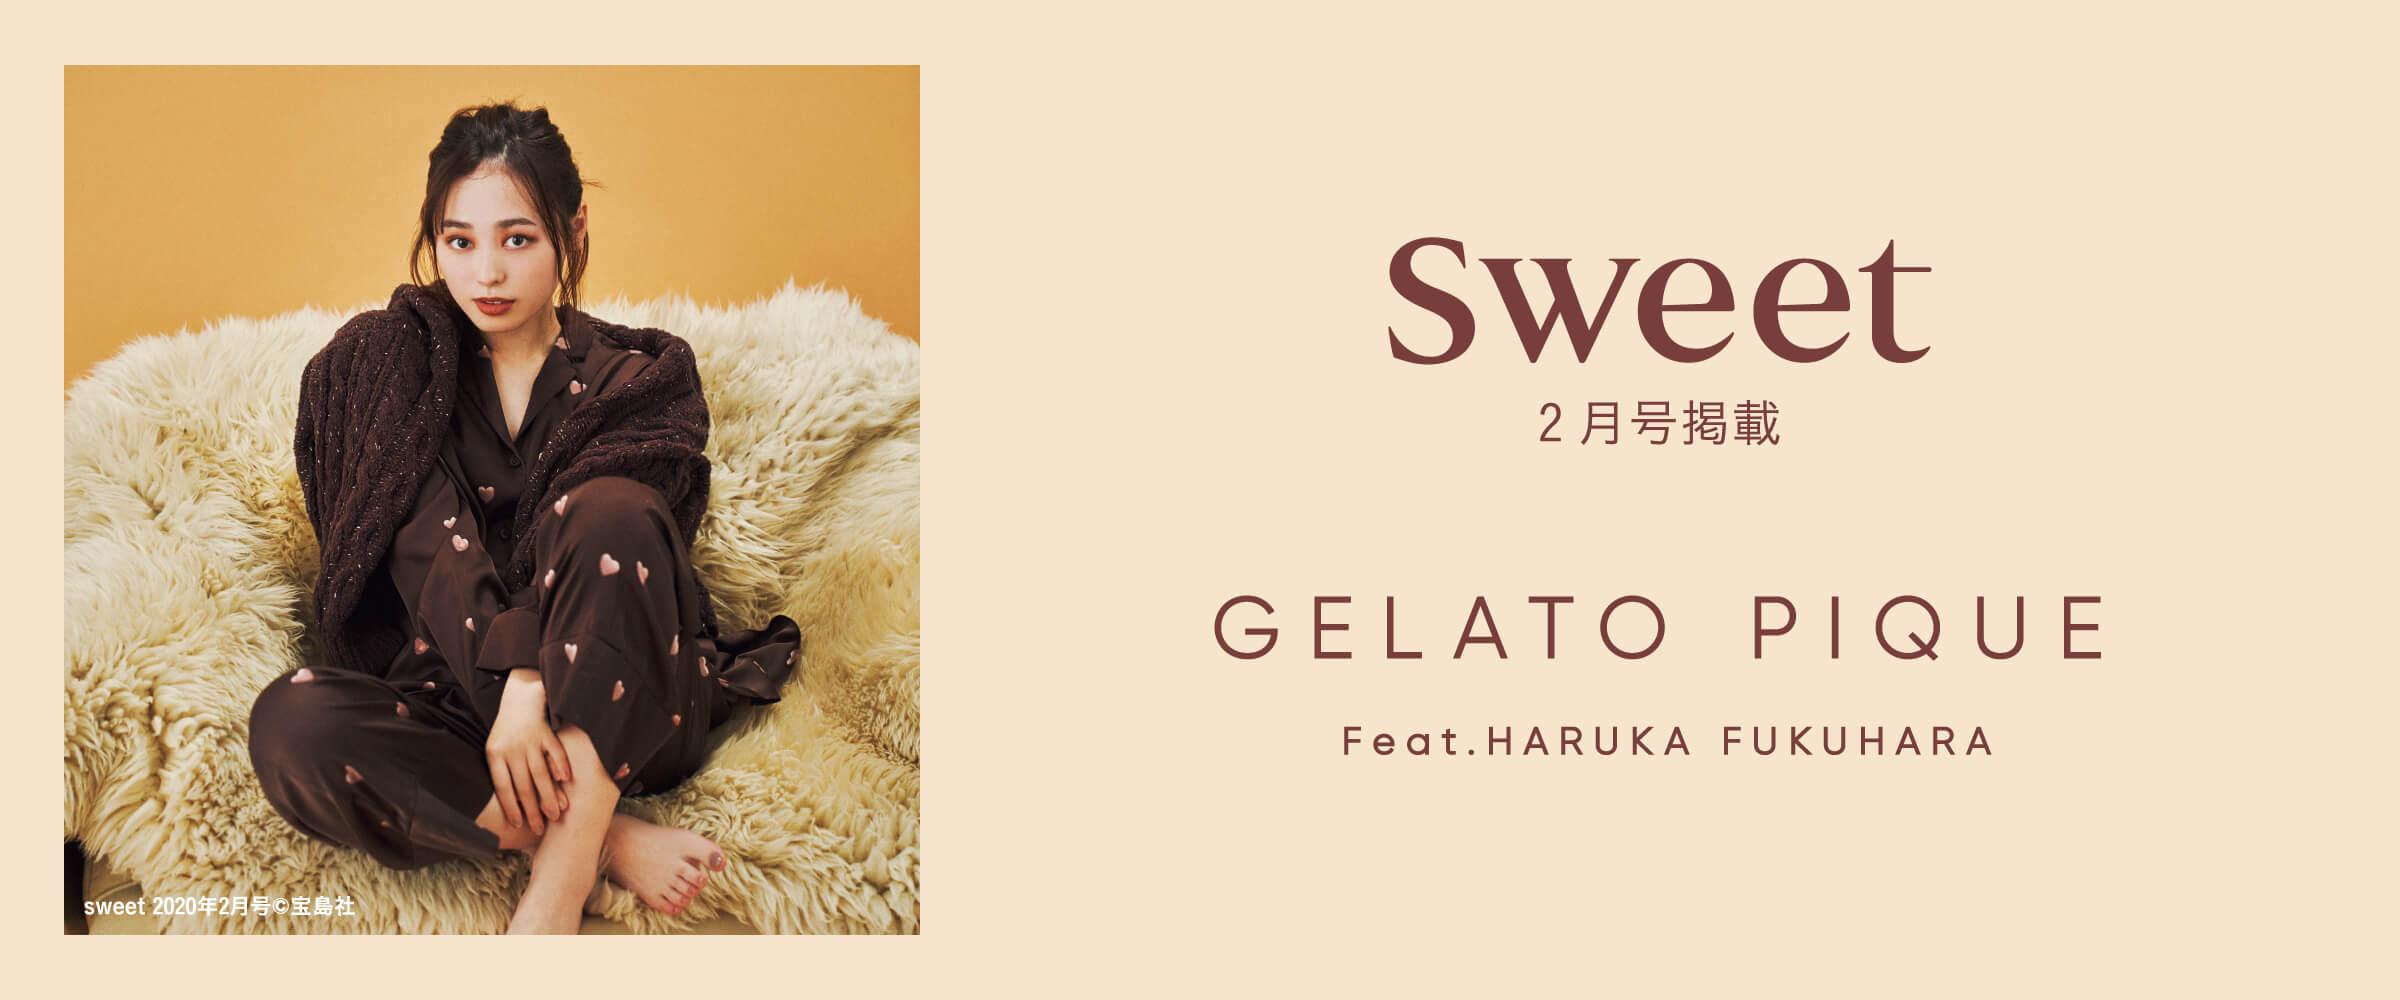 Sweet 2月号掲載 GELATO PIQUE Feat.HARUKA FUKUHARA